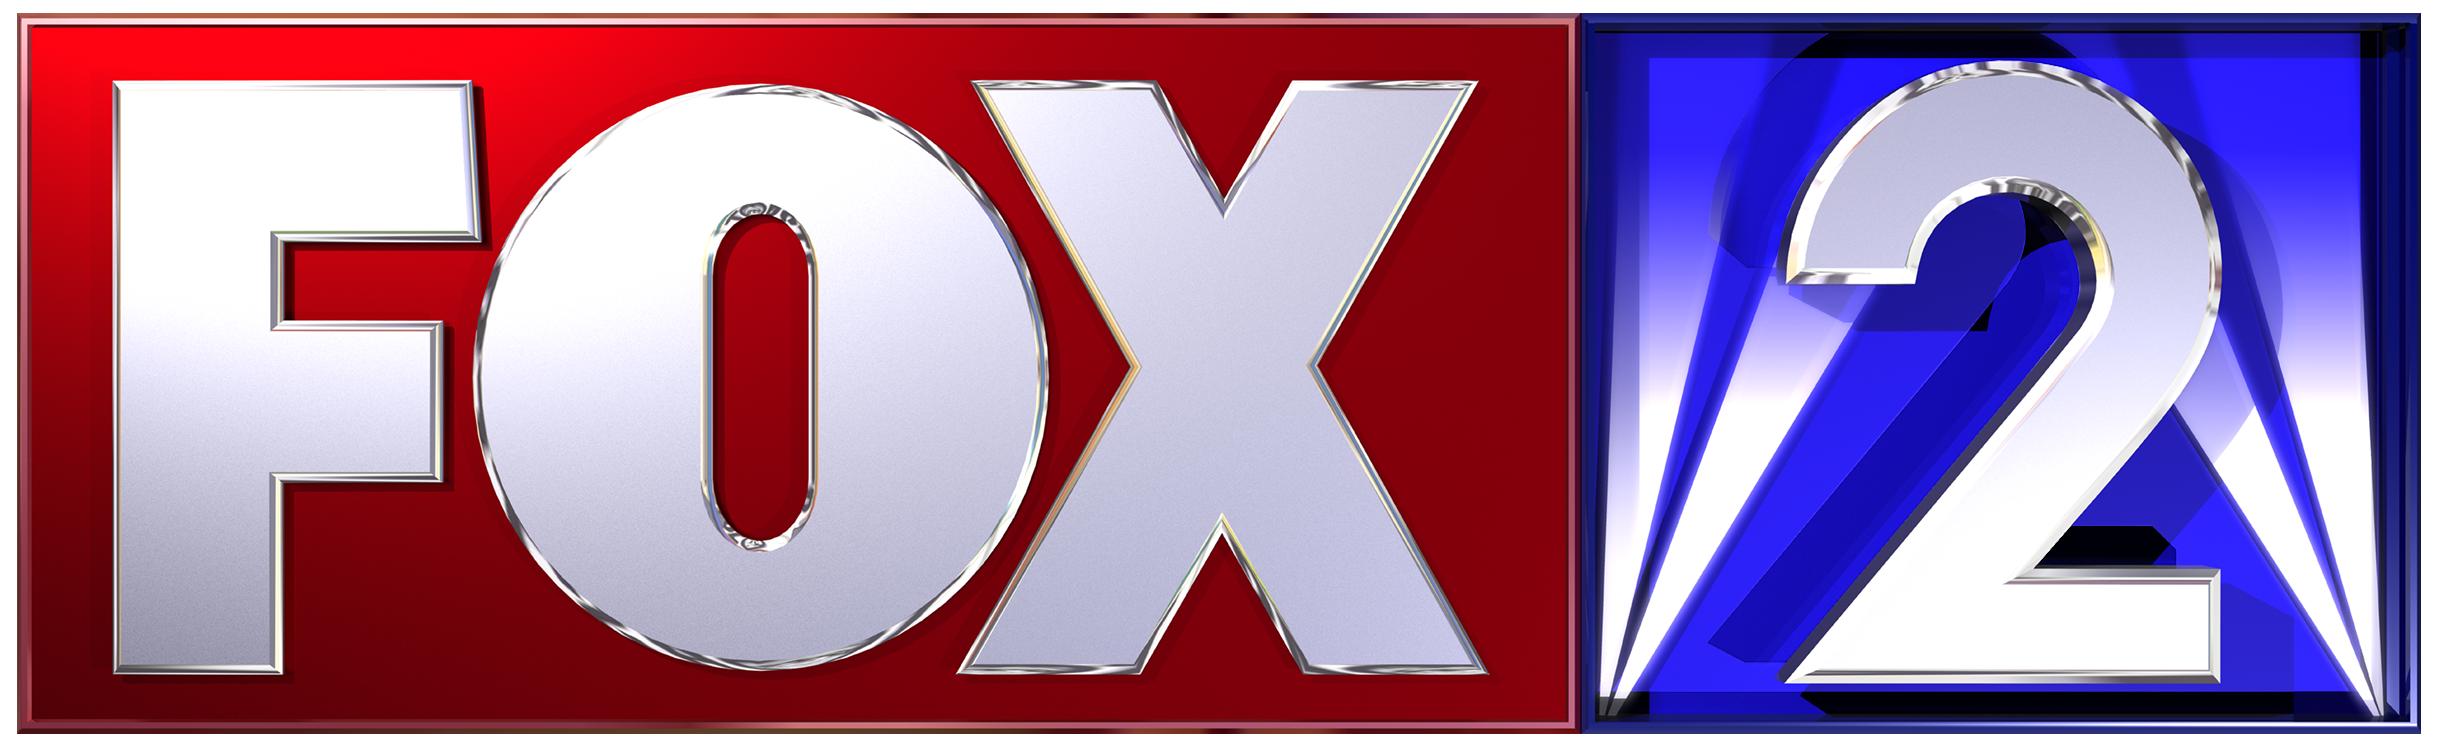 FOX 2 Horizontal 3D RGB hires.png